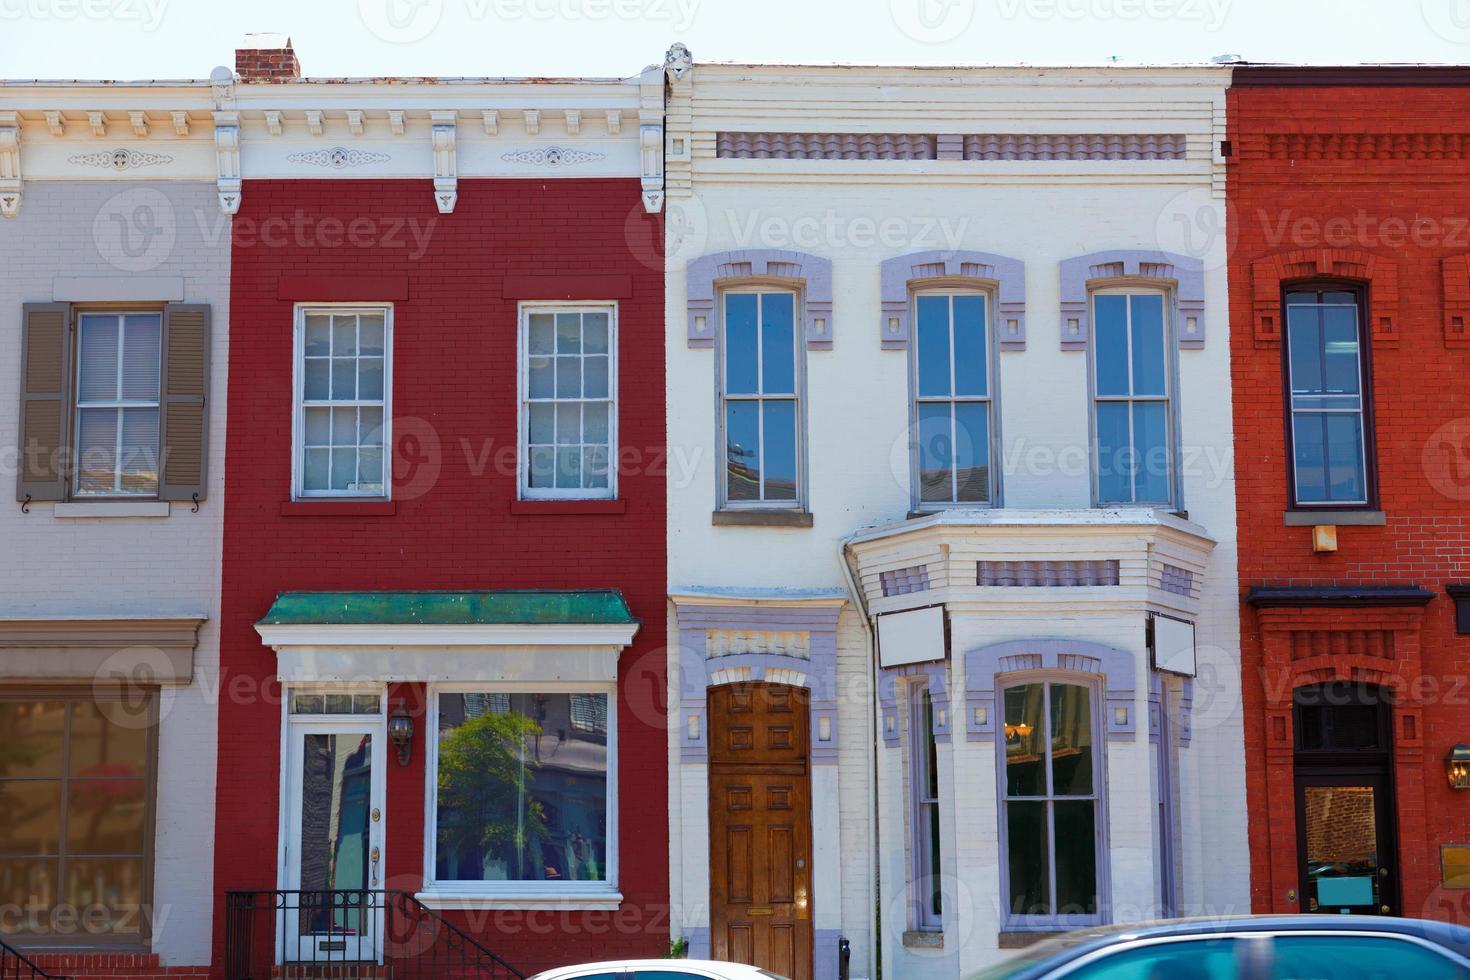 fachadas do distrito histórico de georgetown washington foto